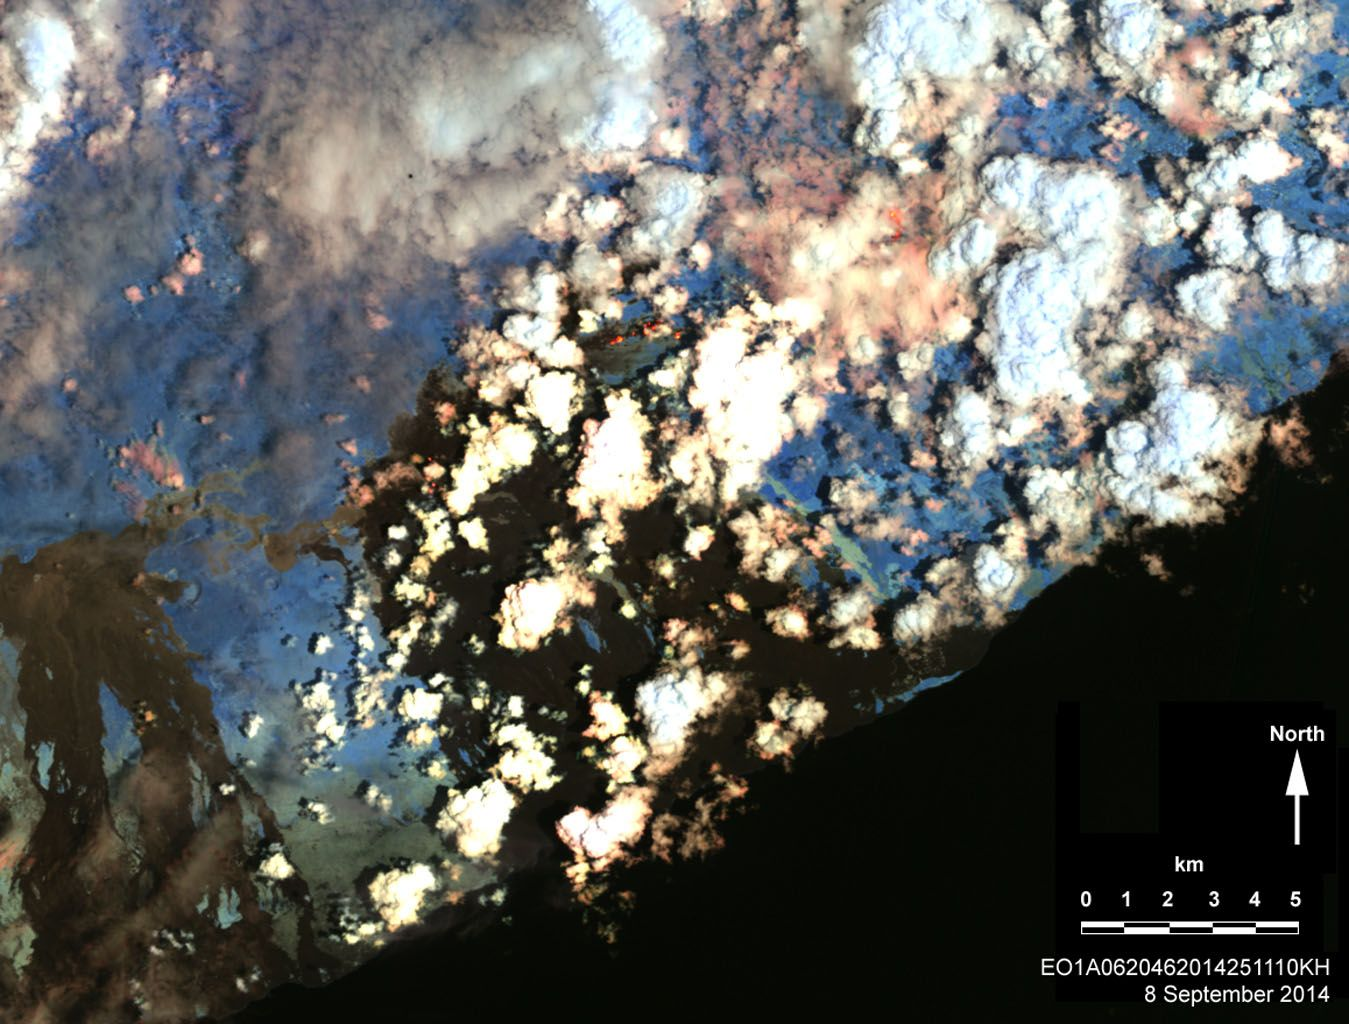 Kilauea volcano, Hawaii, in continuous eruption since 1983. NASA